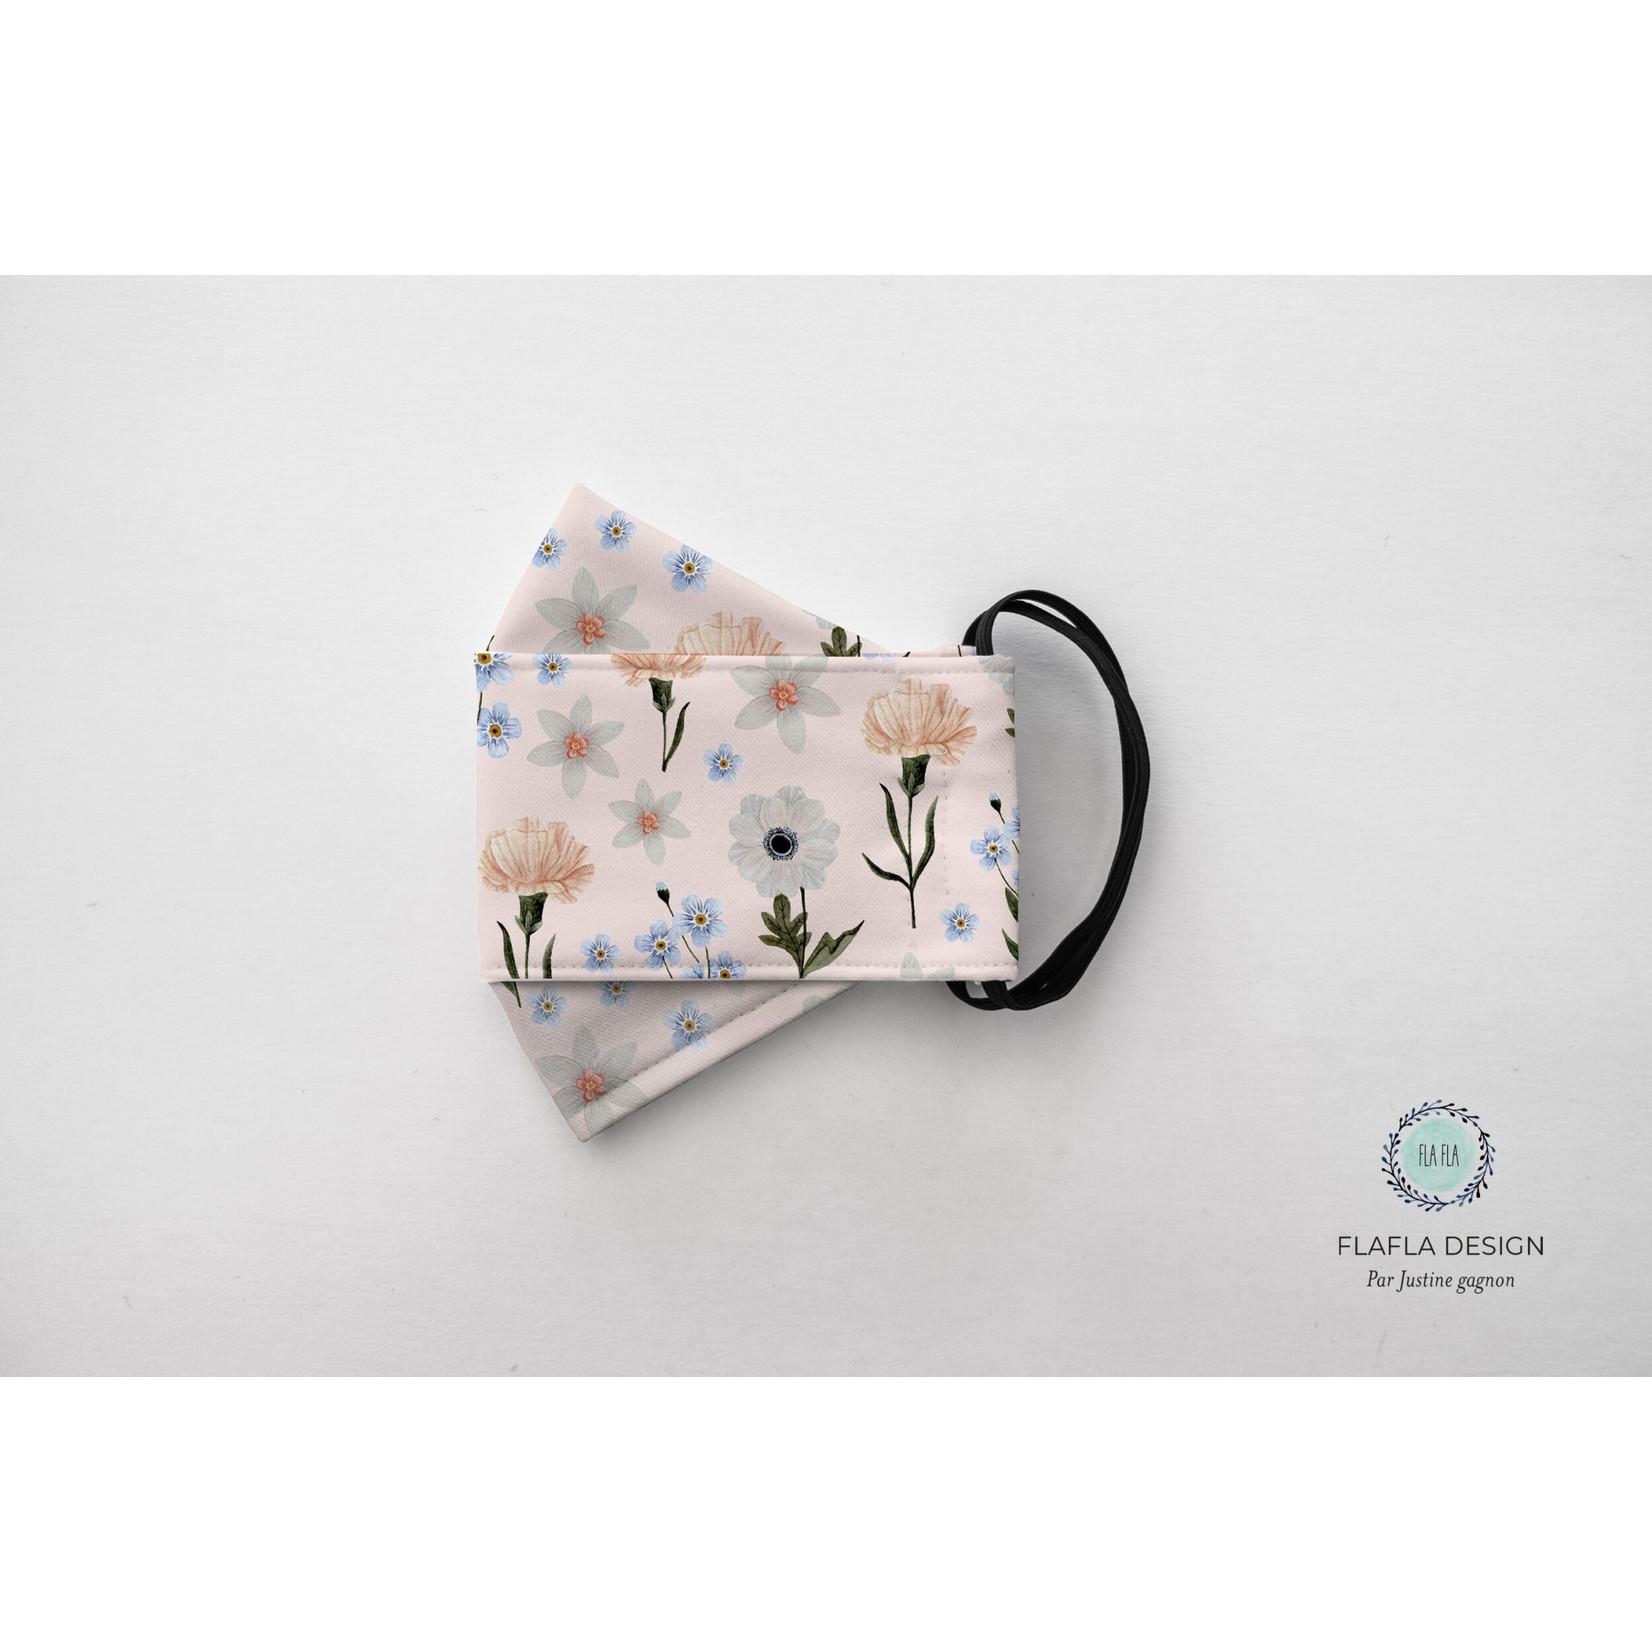 Augustin & co Masque FlaFla / Floral